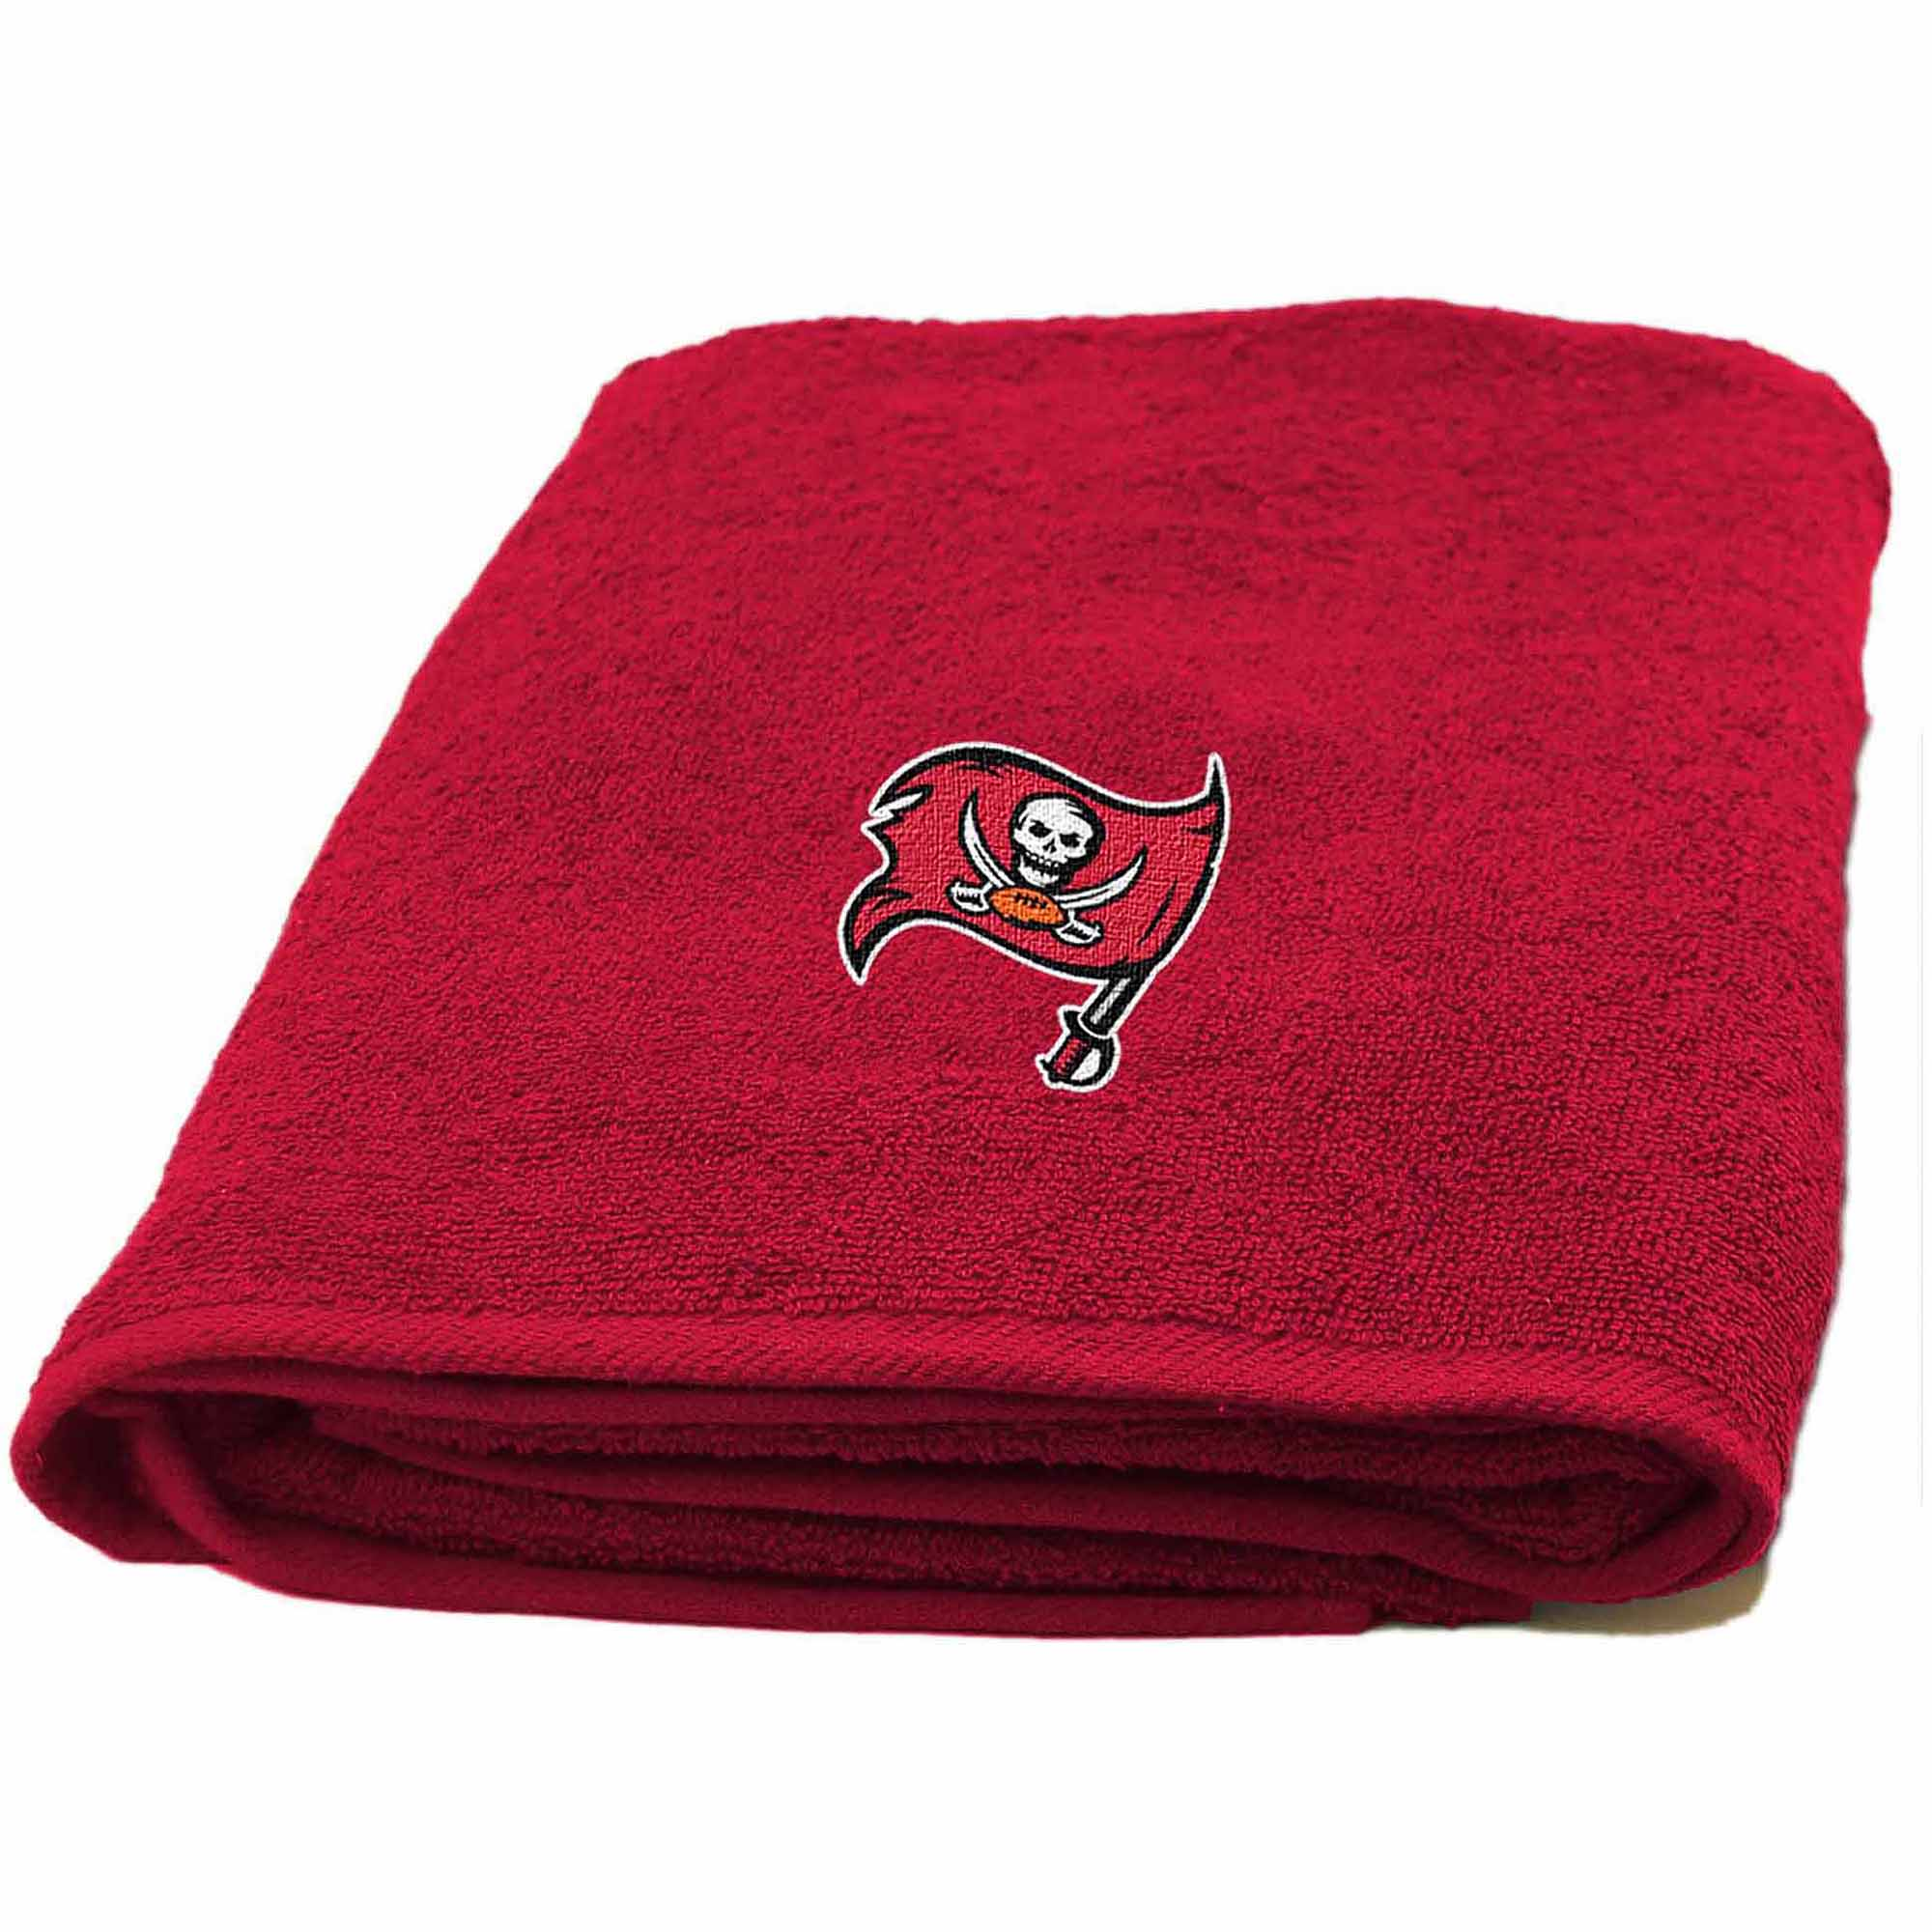 NFL Tampa Bay Buccaneers Decorative Bath Collection - Bath Towel